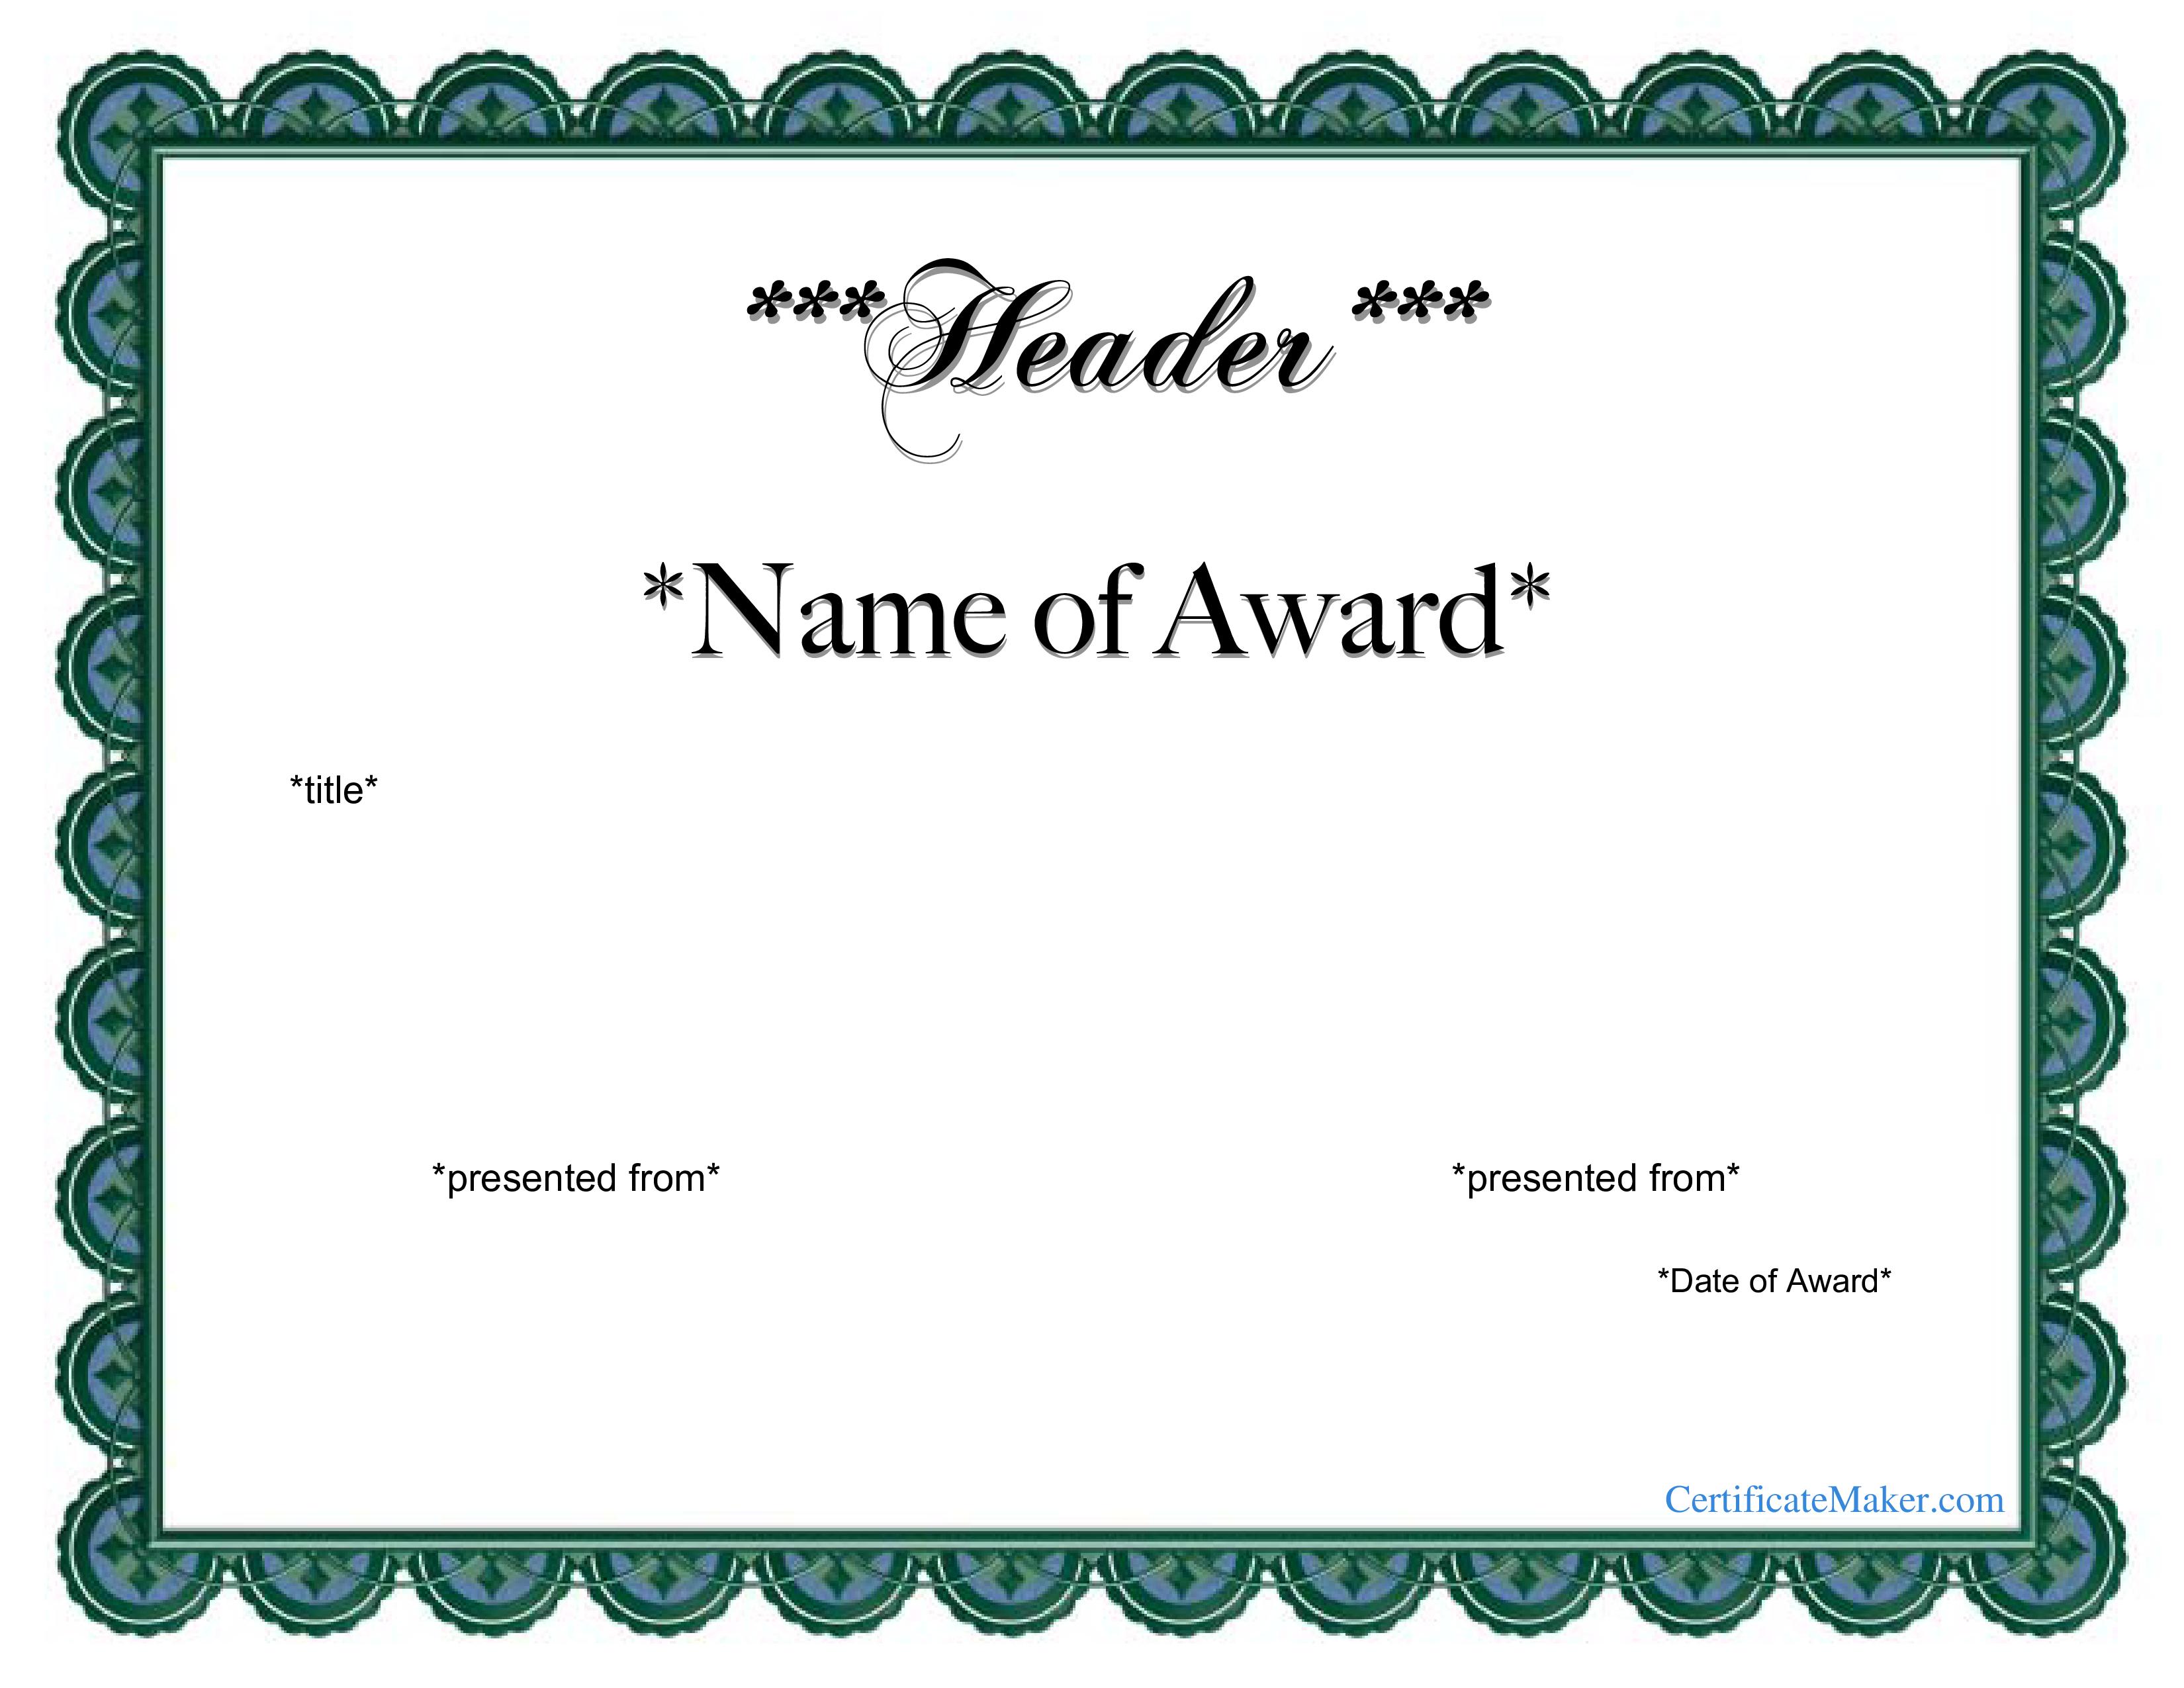 Free Printable Award Certificates Certificate Templates At - Free Printable Student Award Certificate Template